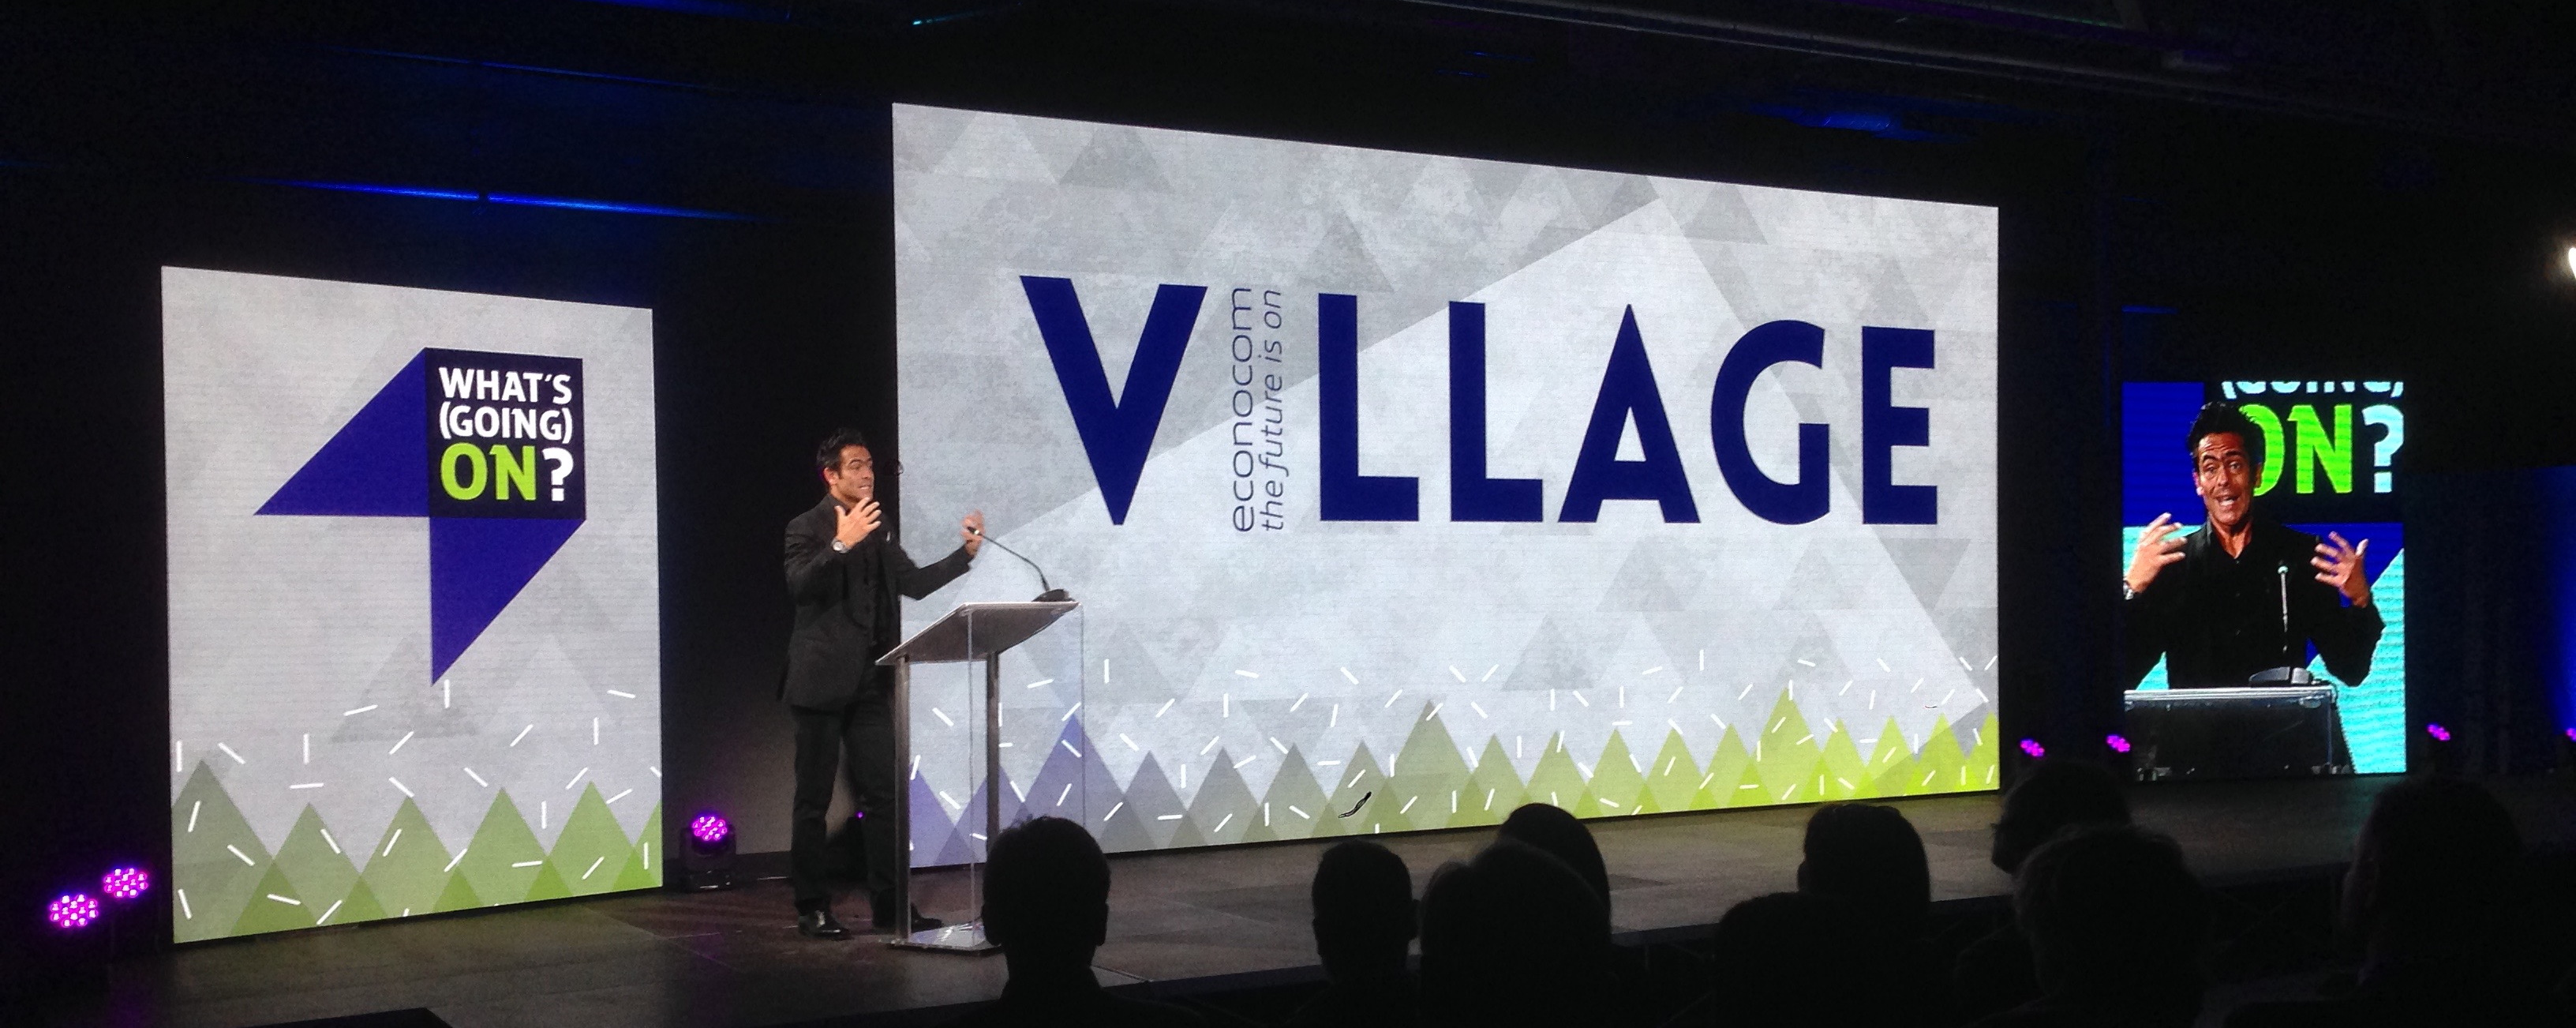 The Future Is ON Village